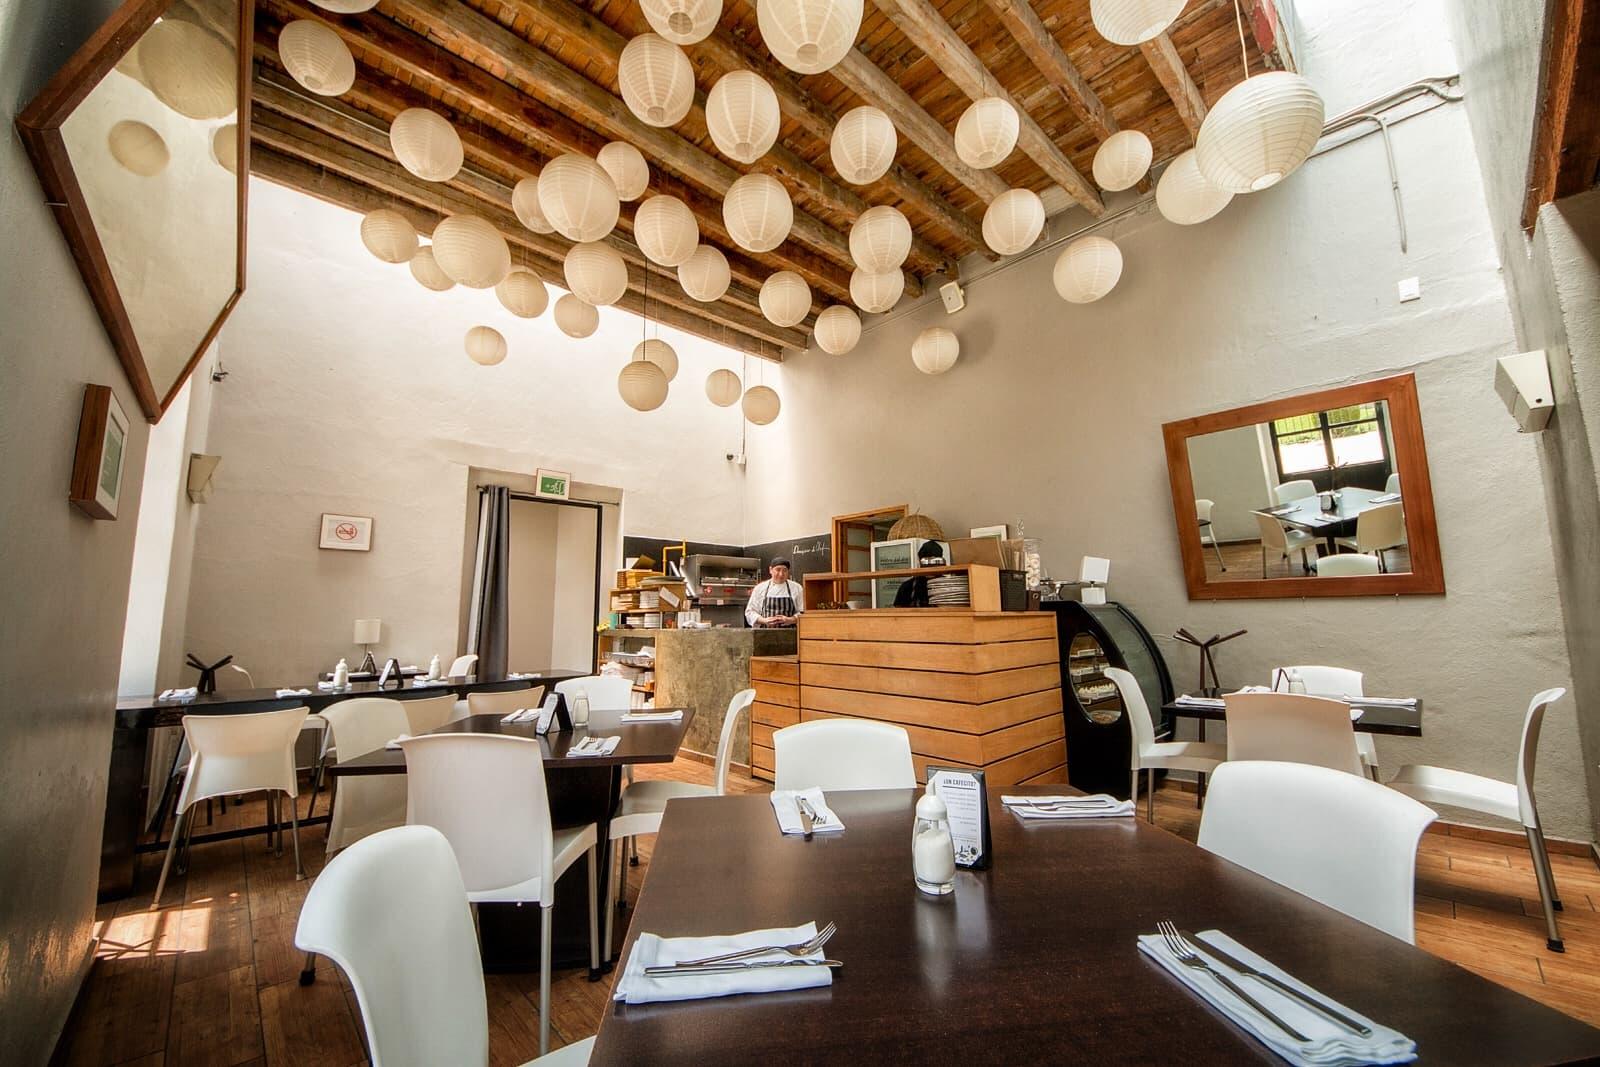 Lusso Café de Toluca gana premio Travellers' Choice 2020